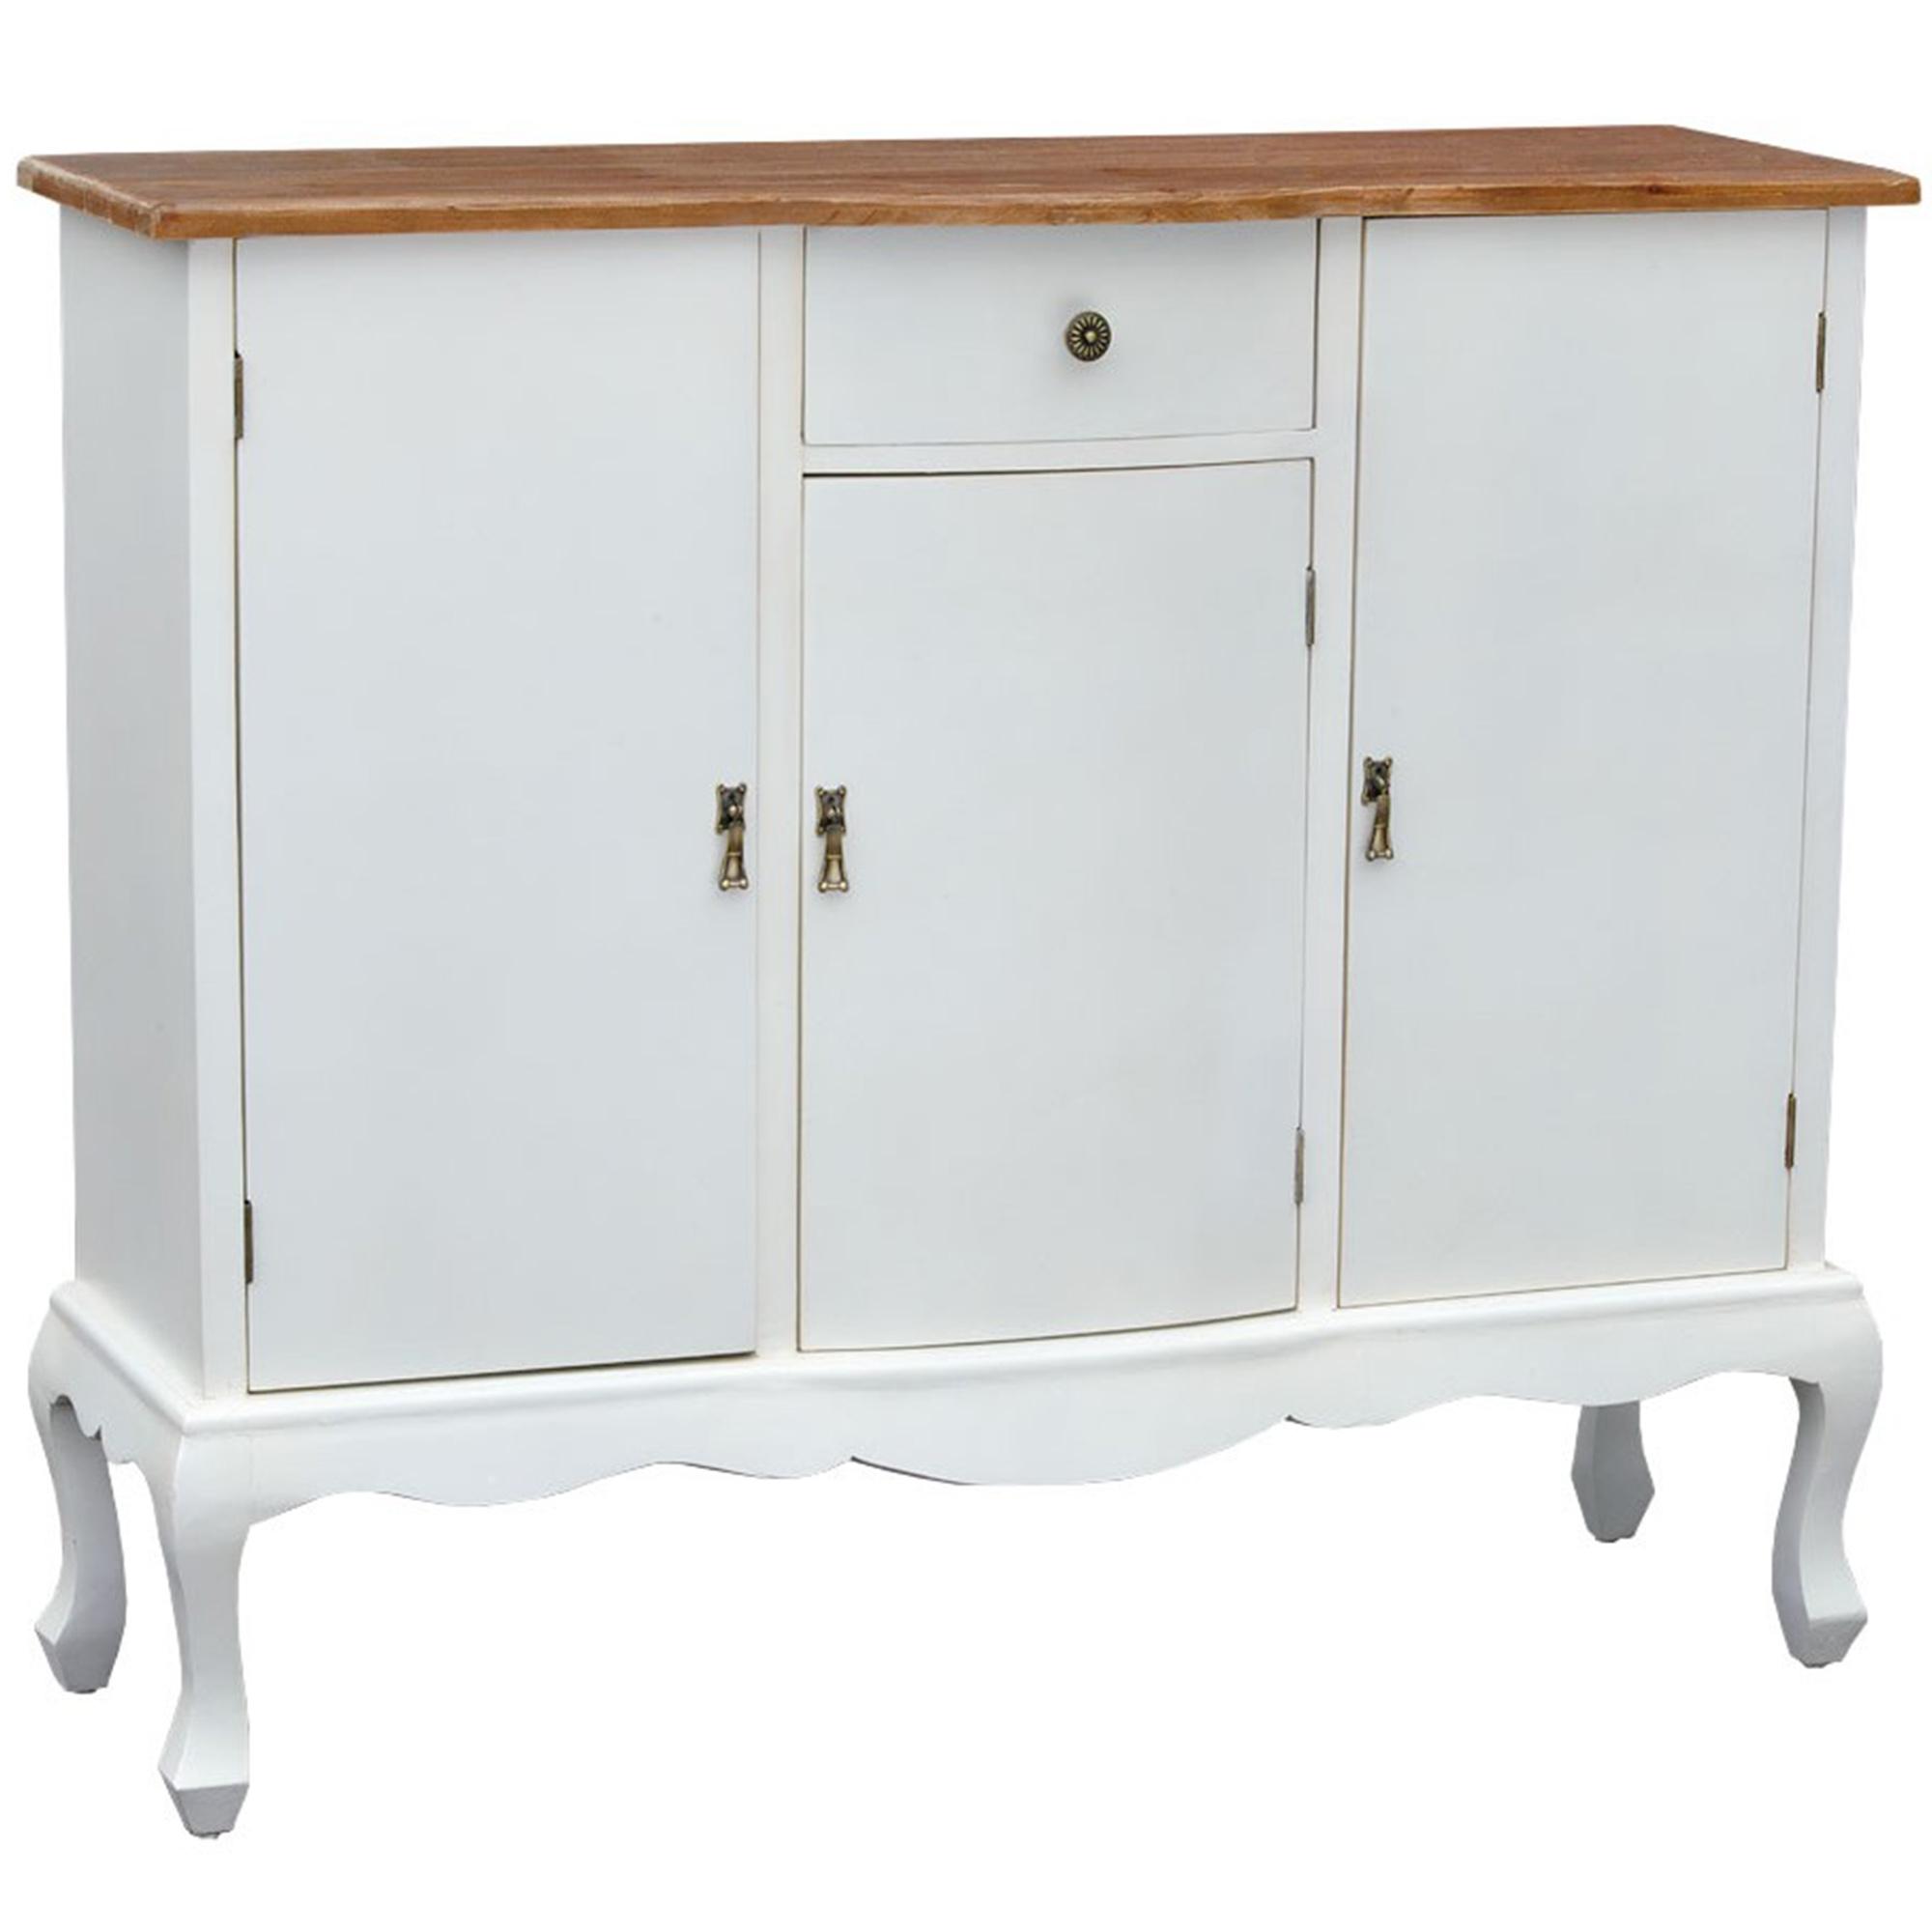 Transylvania Shabby Chic Large Cabinet